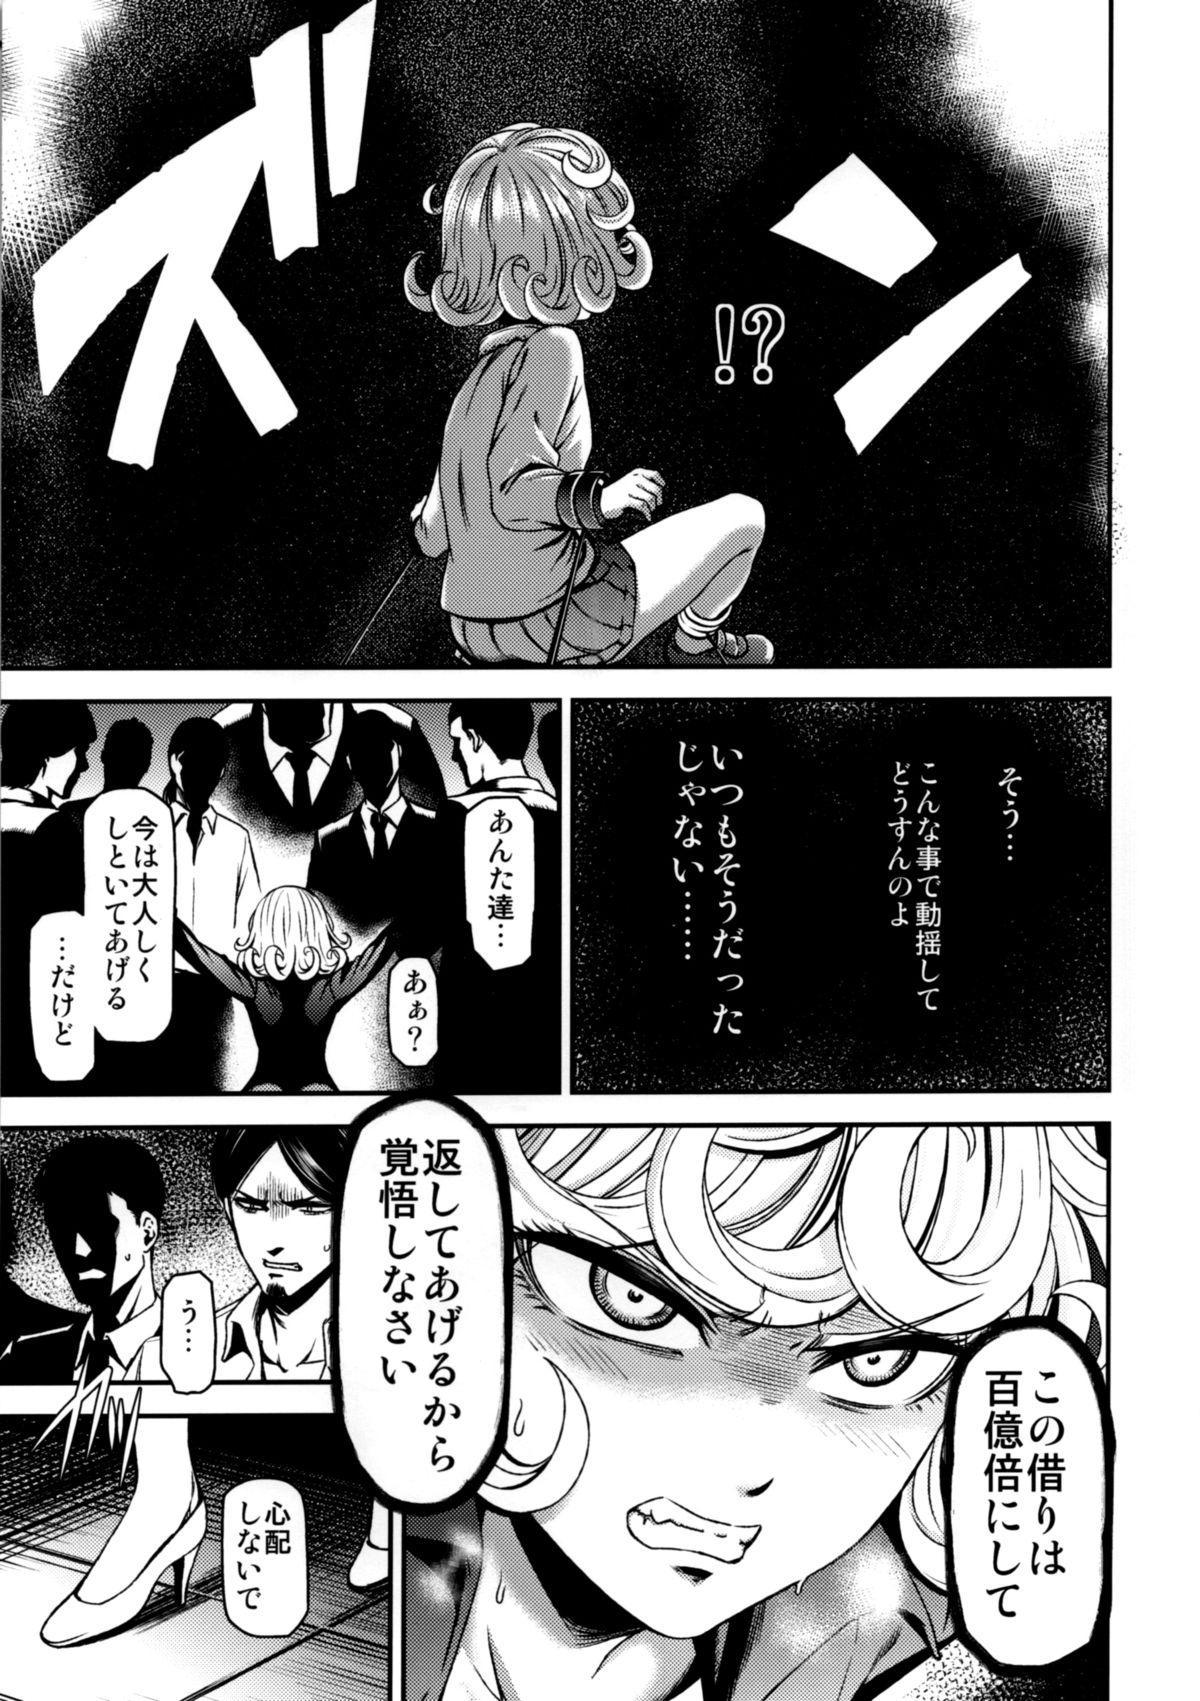 (C89) [Kiyosumi Hurricane (Kiyosumi Hurricane)] ONE-HURRICANE - Kutsujoku no Tatsumaki (One Punch Man) 5